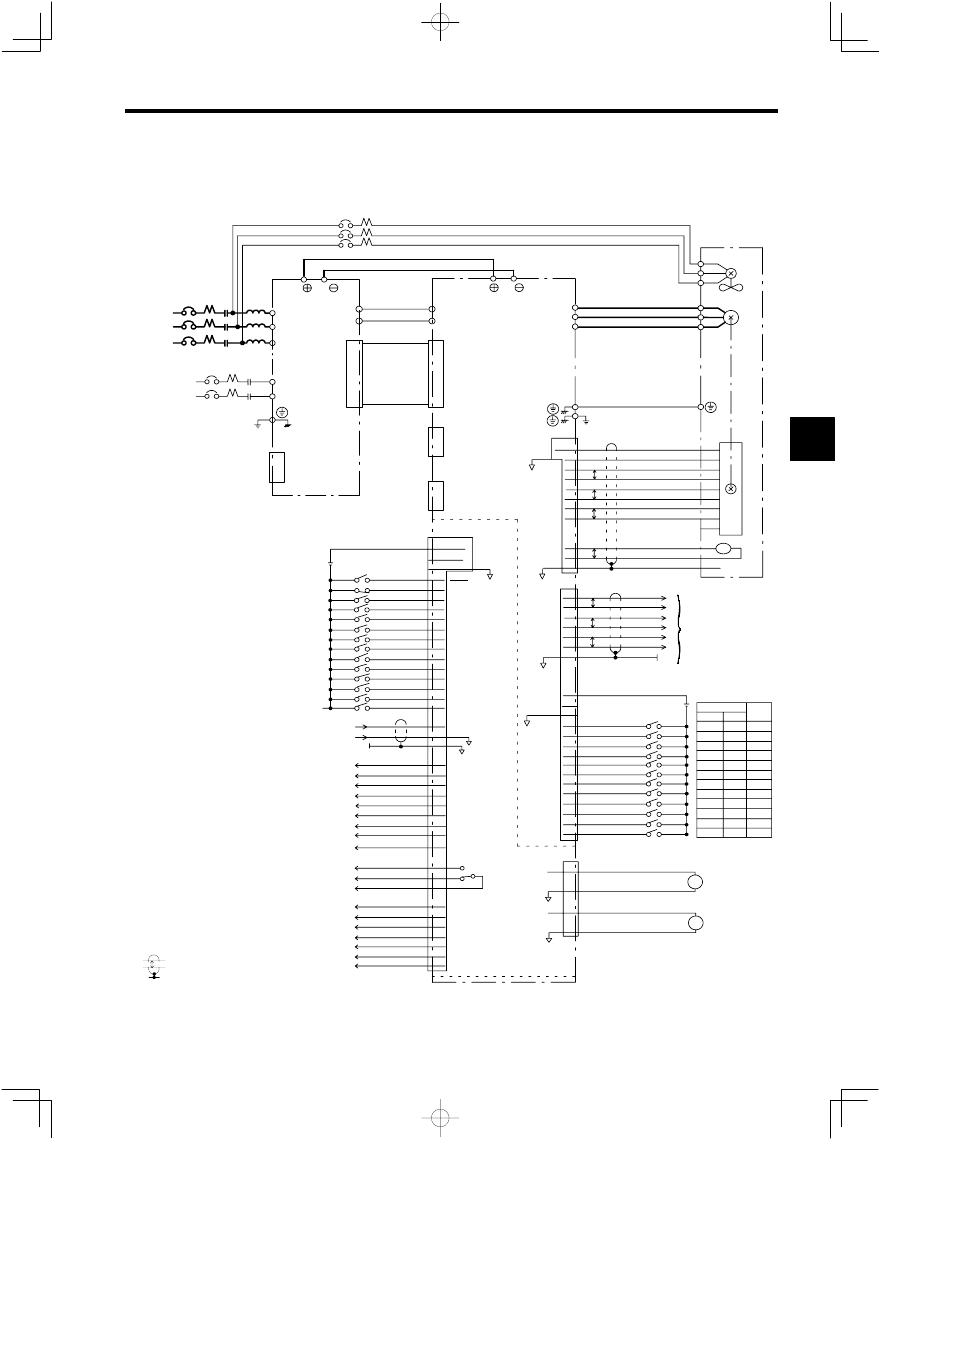 Magnetic Contactor Wiring Diagram 3ph Yaskawa Car Diagrams 2 Connection Varispeed 626m5 User Manual Page 45 Rh Manualsdir Com Pole 3